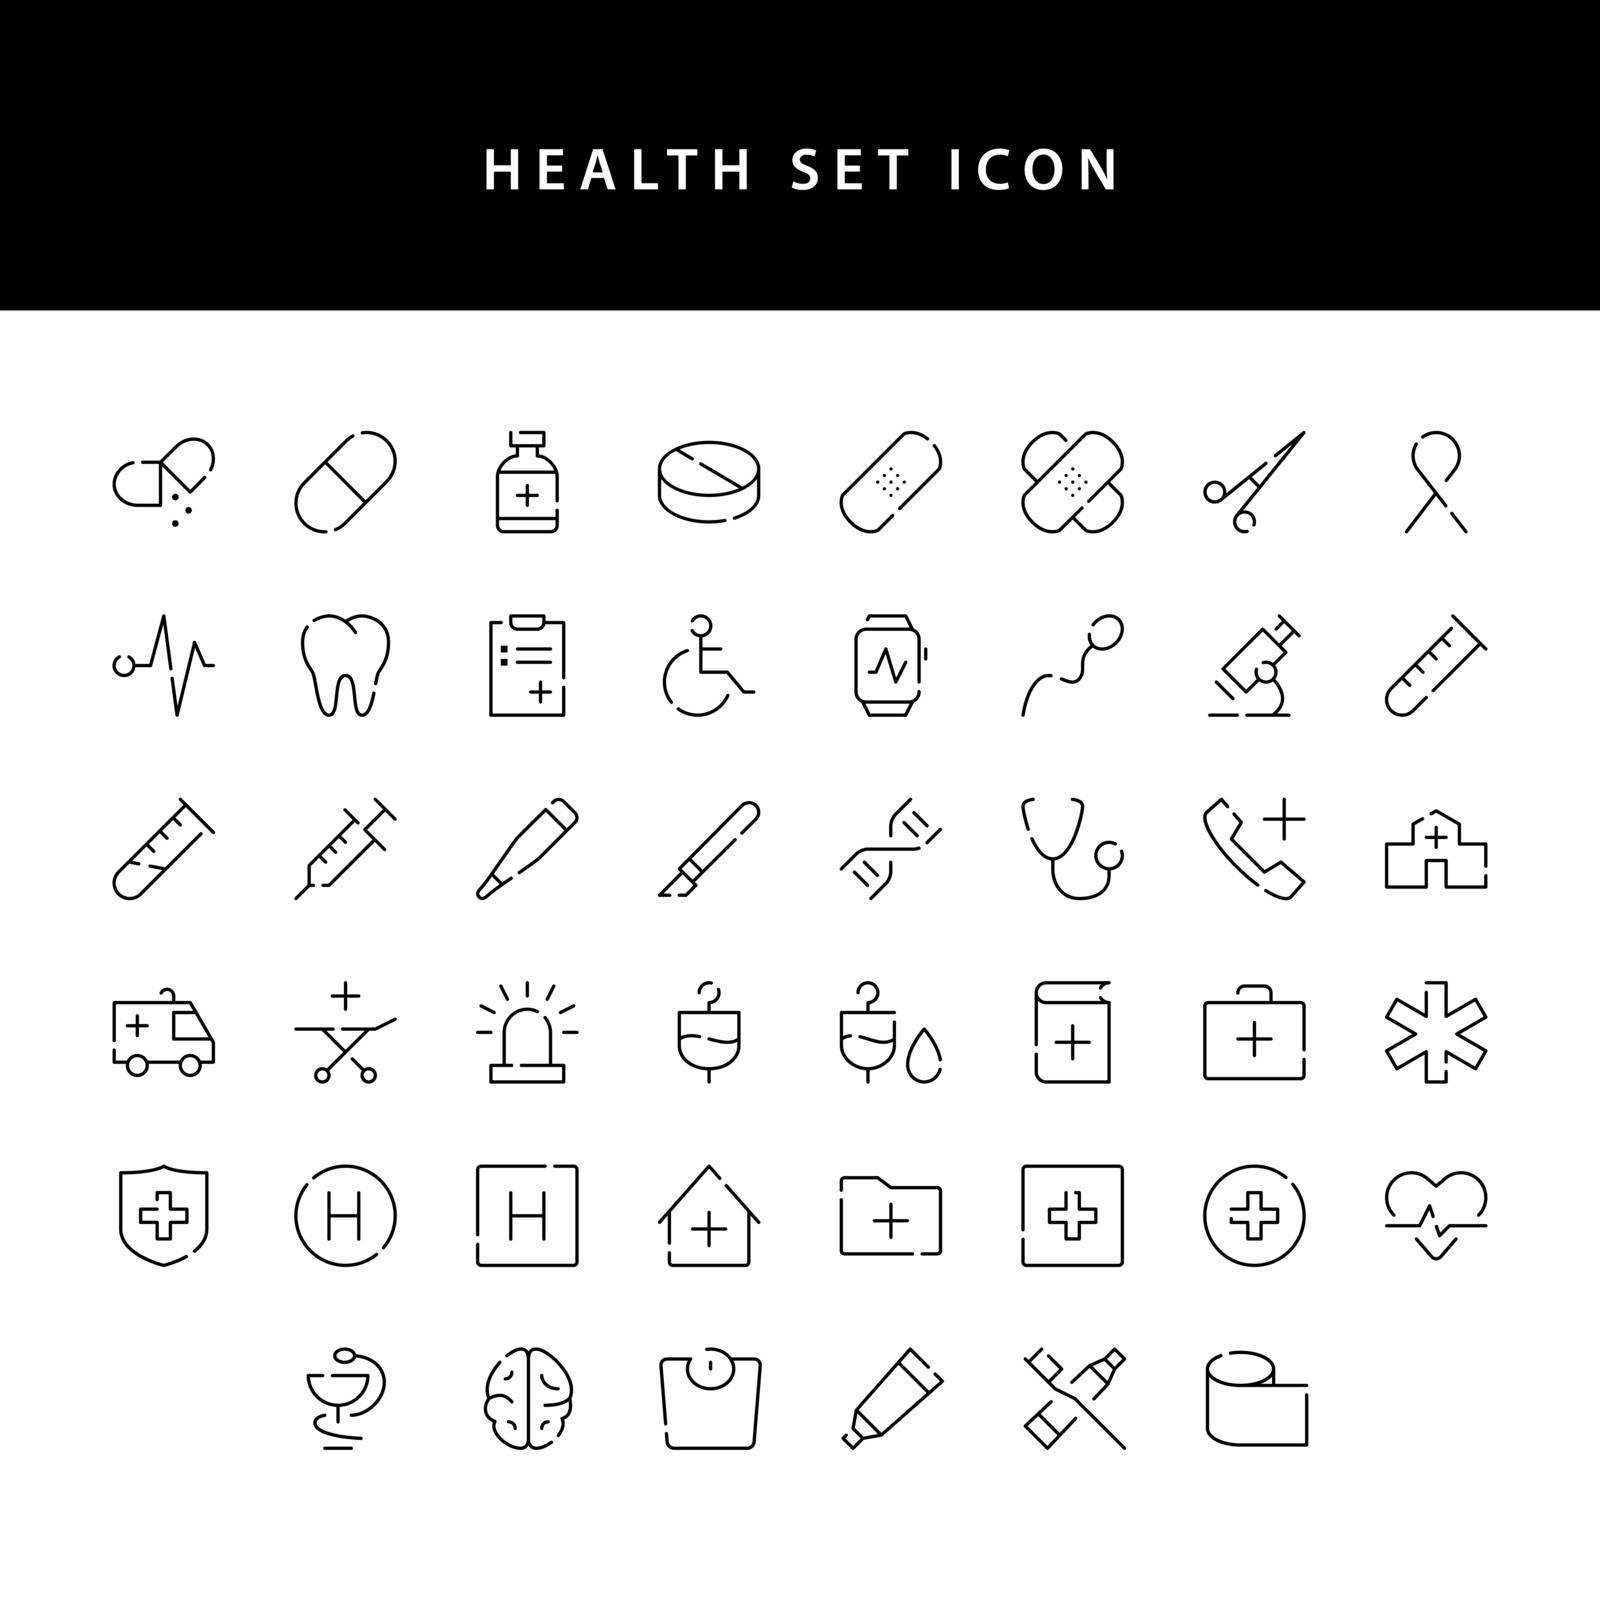 healt icon set outline set